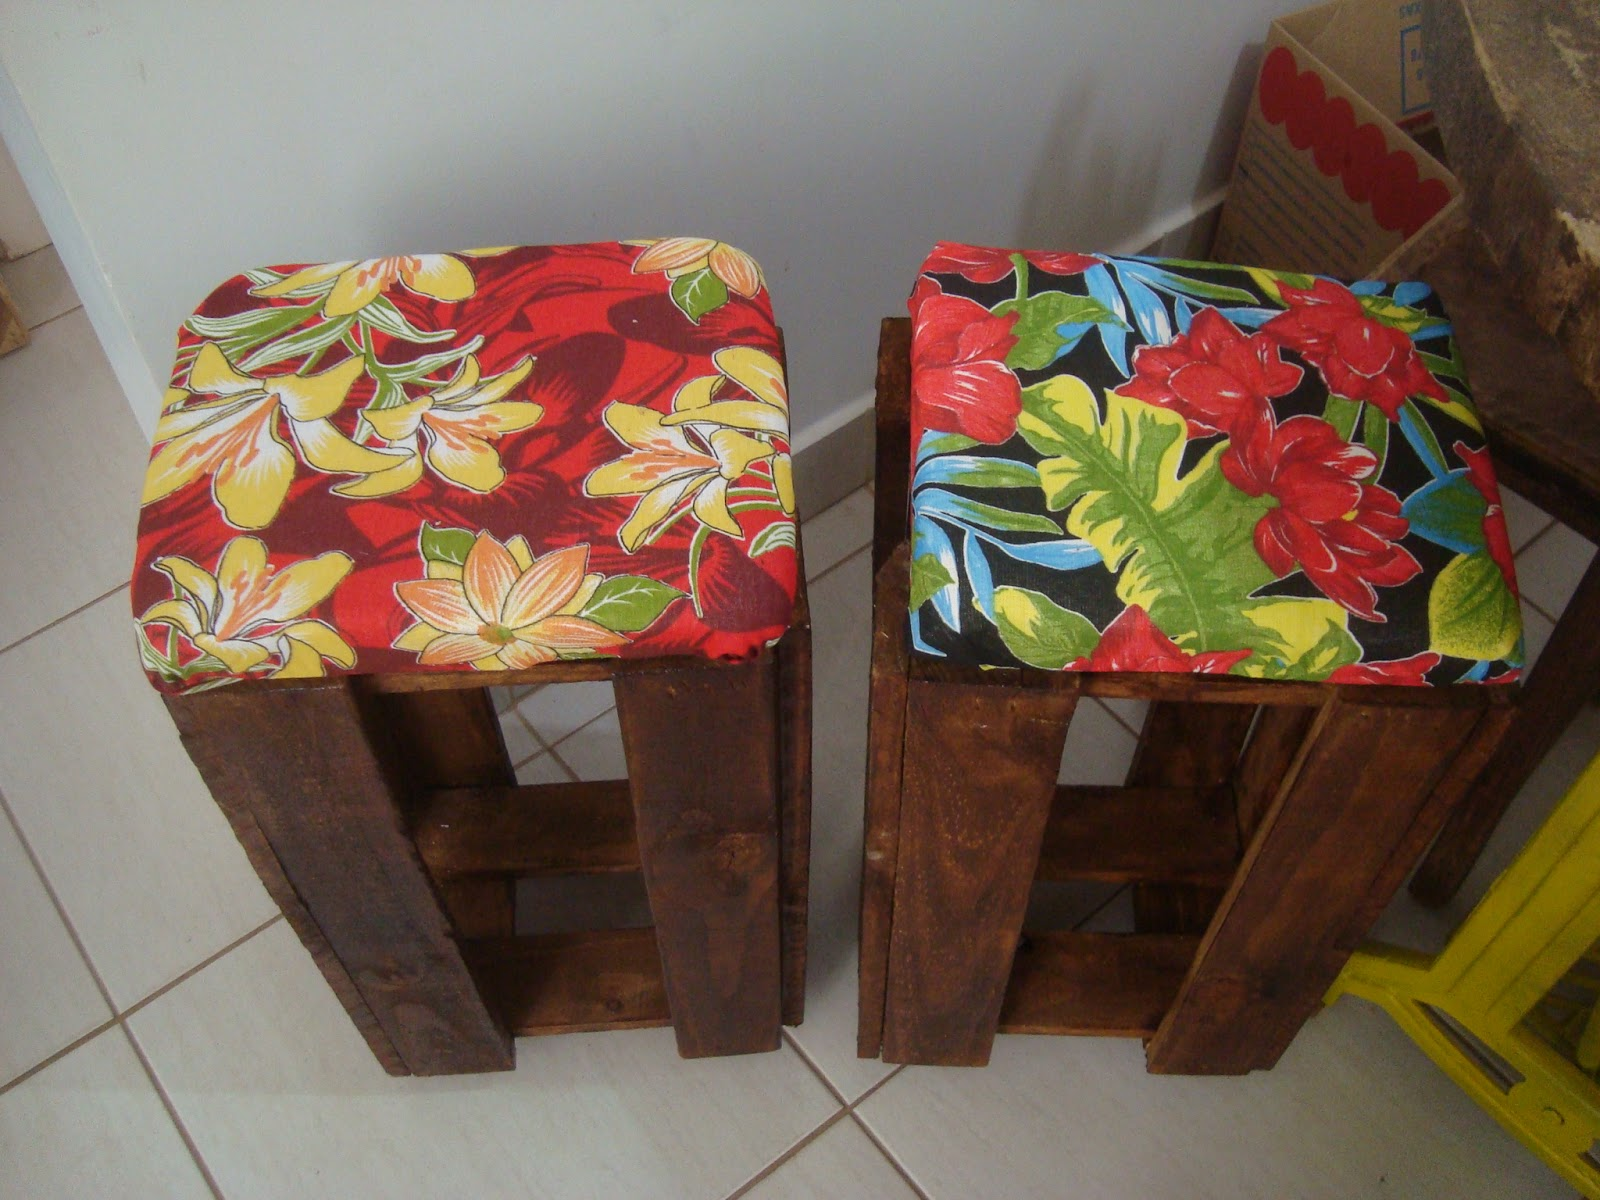 Rosa Luiza Artes e Gostosuras: Caixotes que viraram bancos estilosos  #9F2C2C 1600x1200